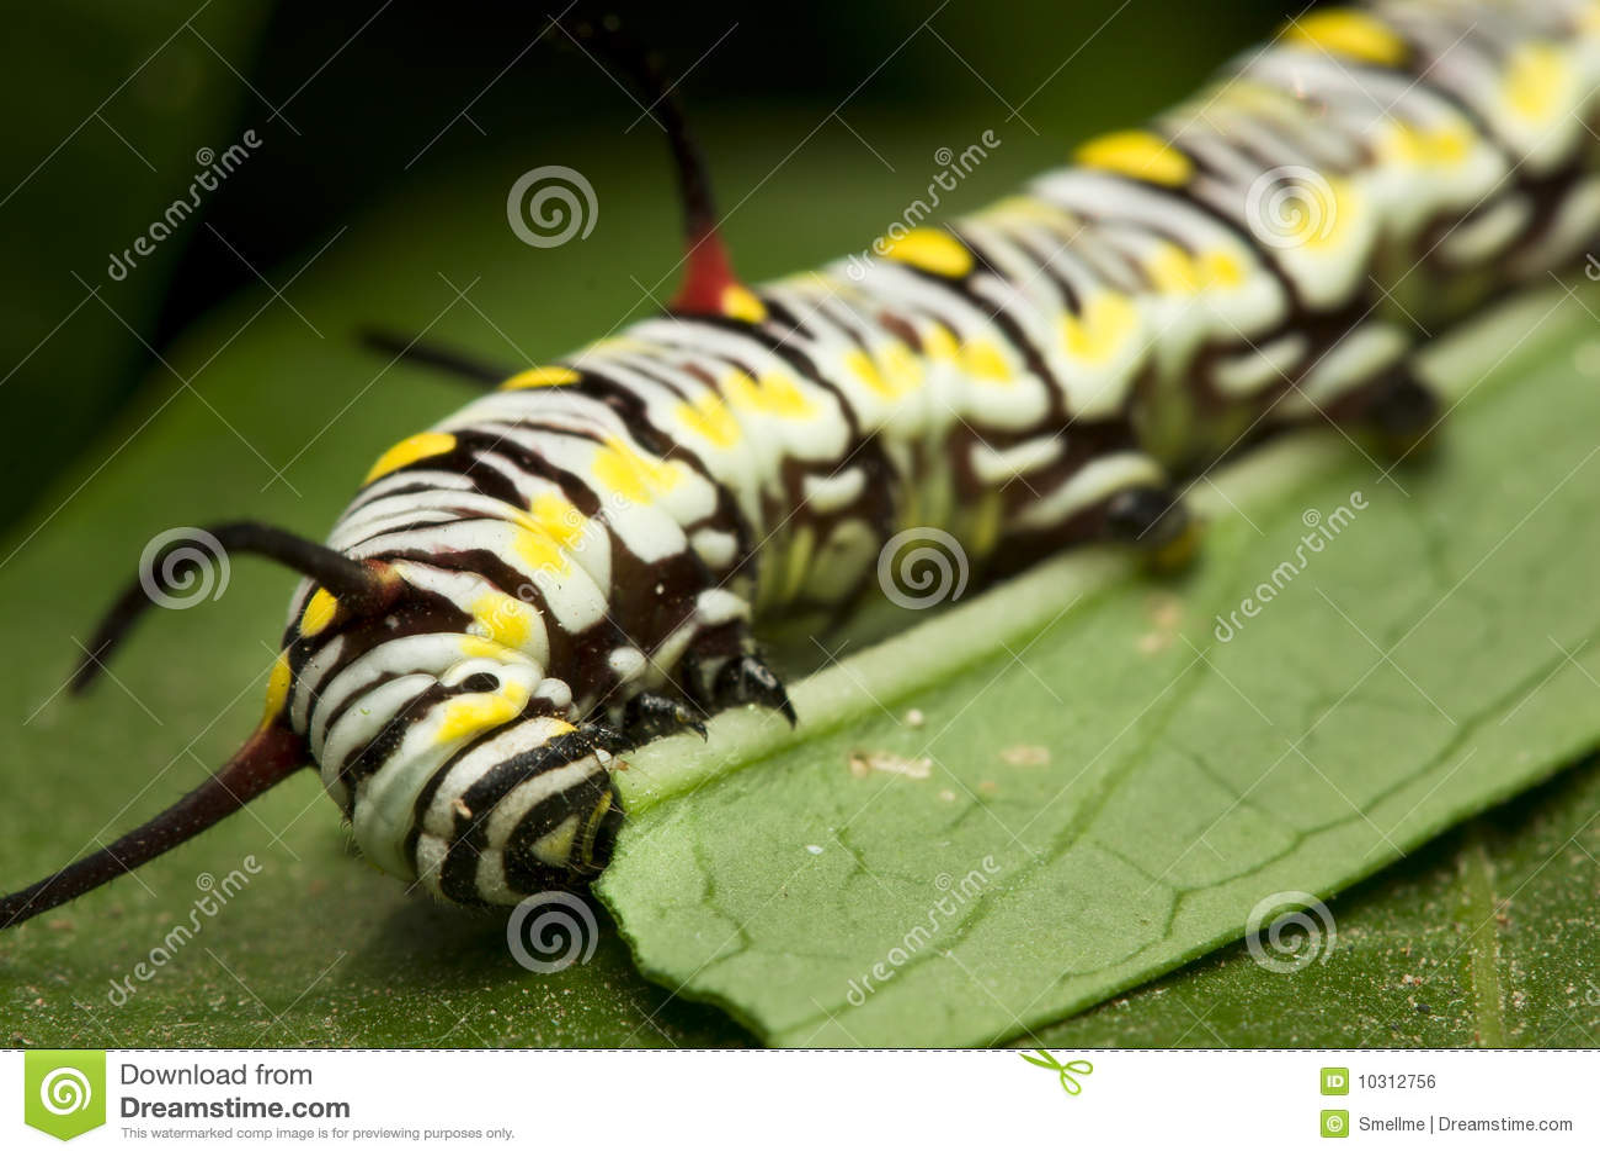 Download Caterpillar stock photo. Image of harmony, ecosystem - 10312756